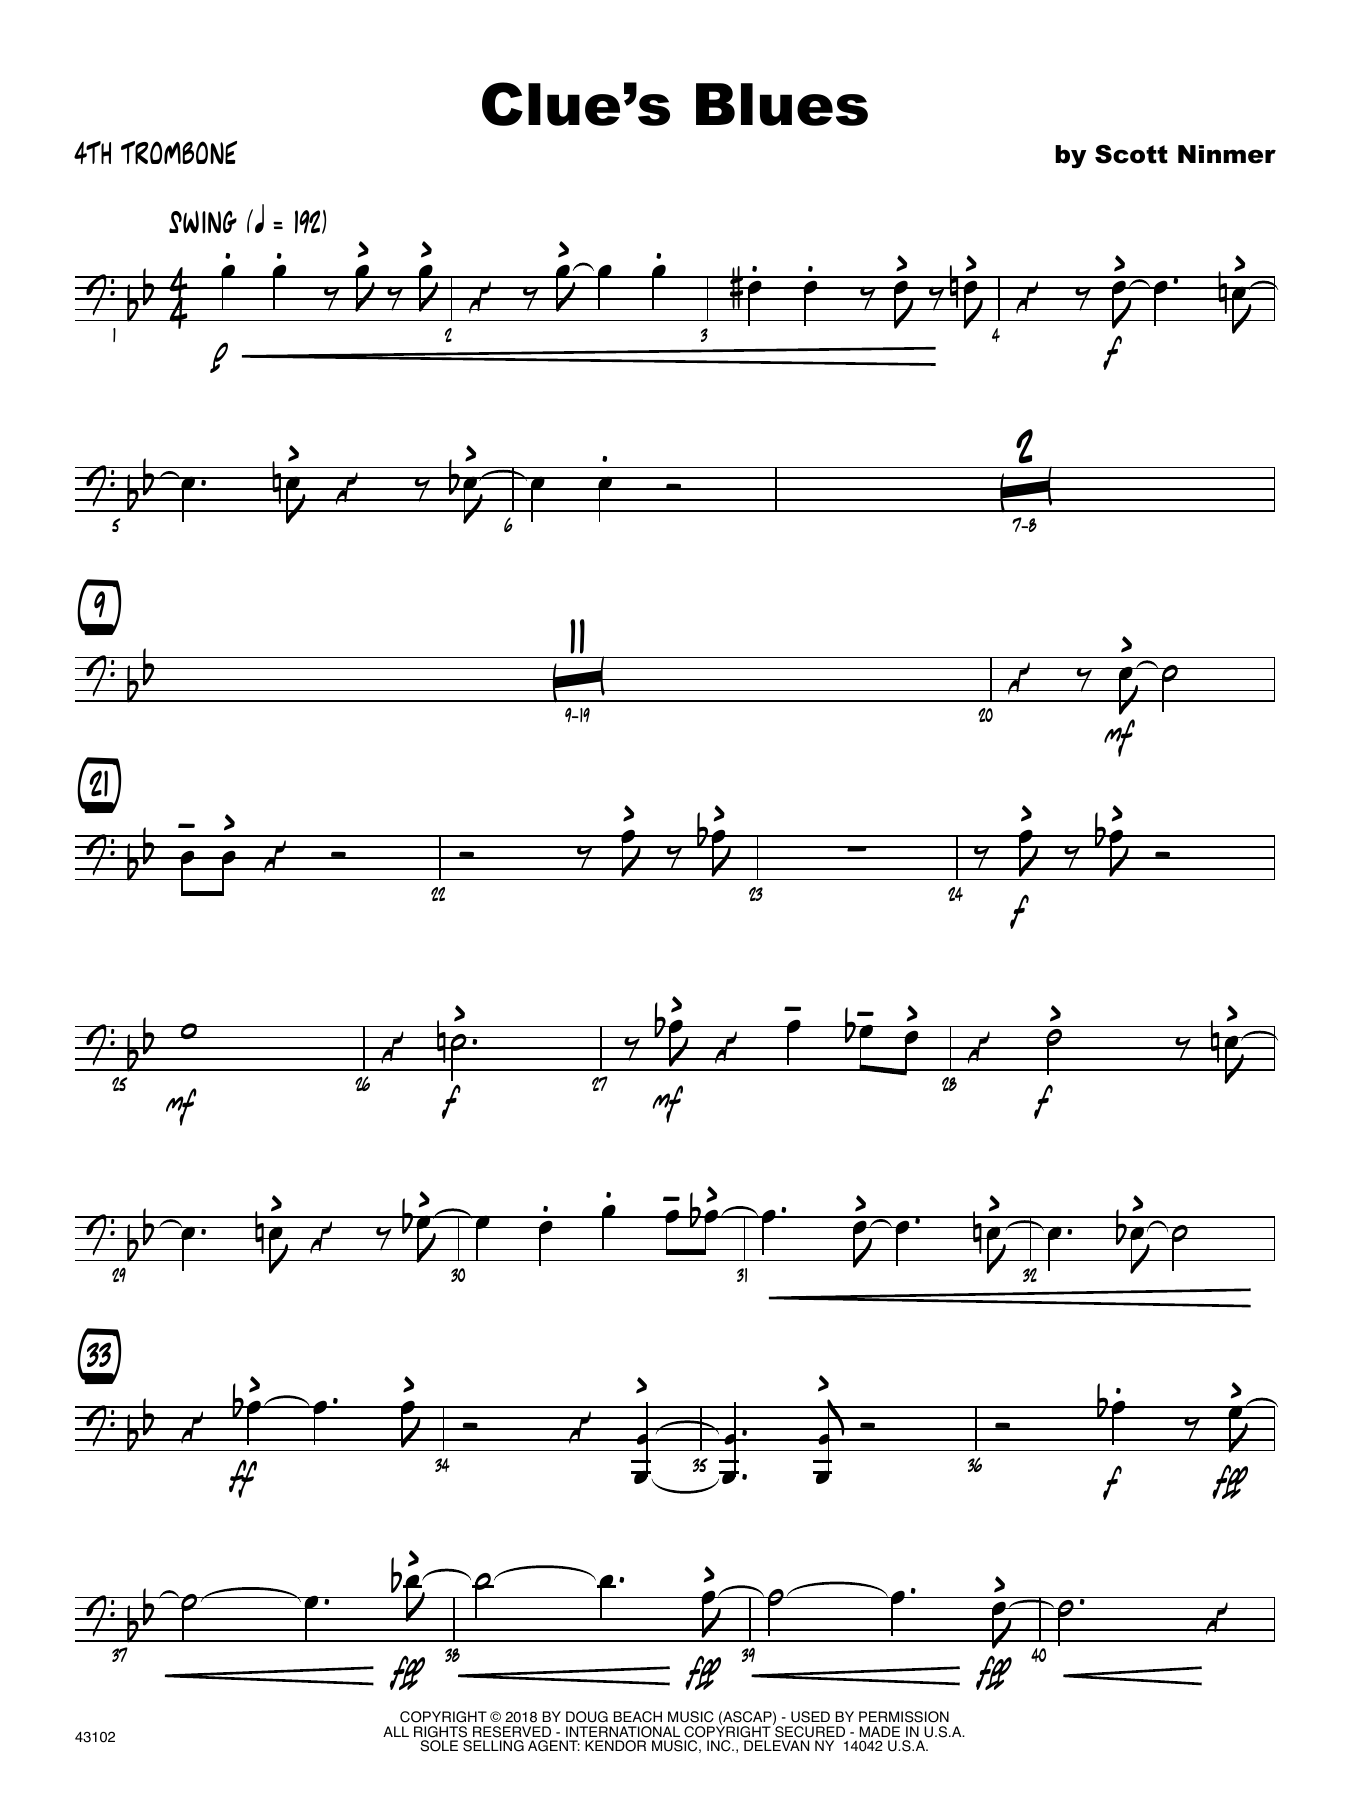 Scott Ninmer Clue's Blues - 4th Trombone sheet music notes printable PDF score